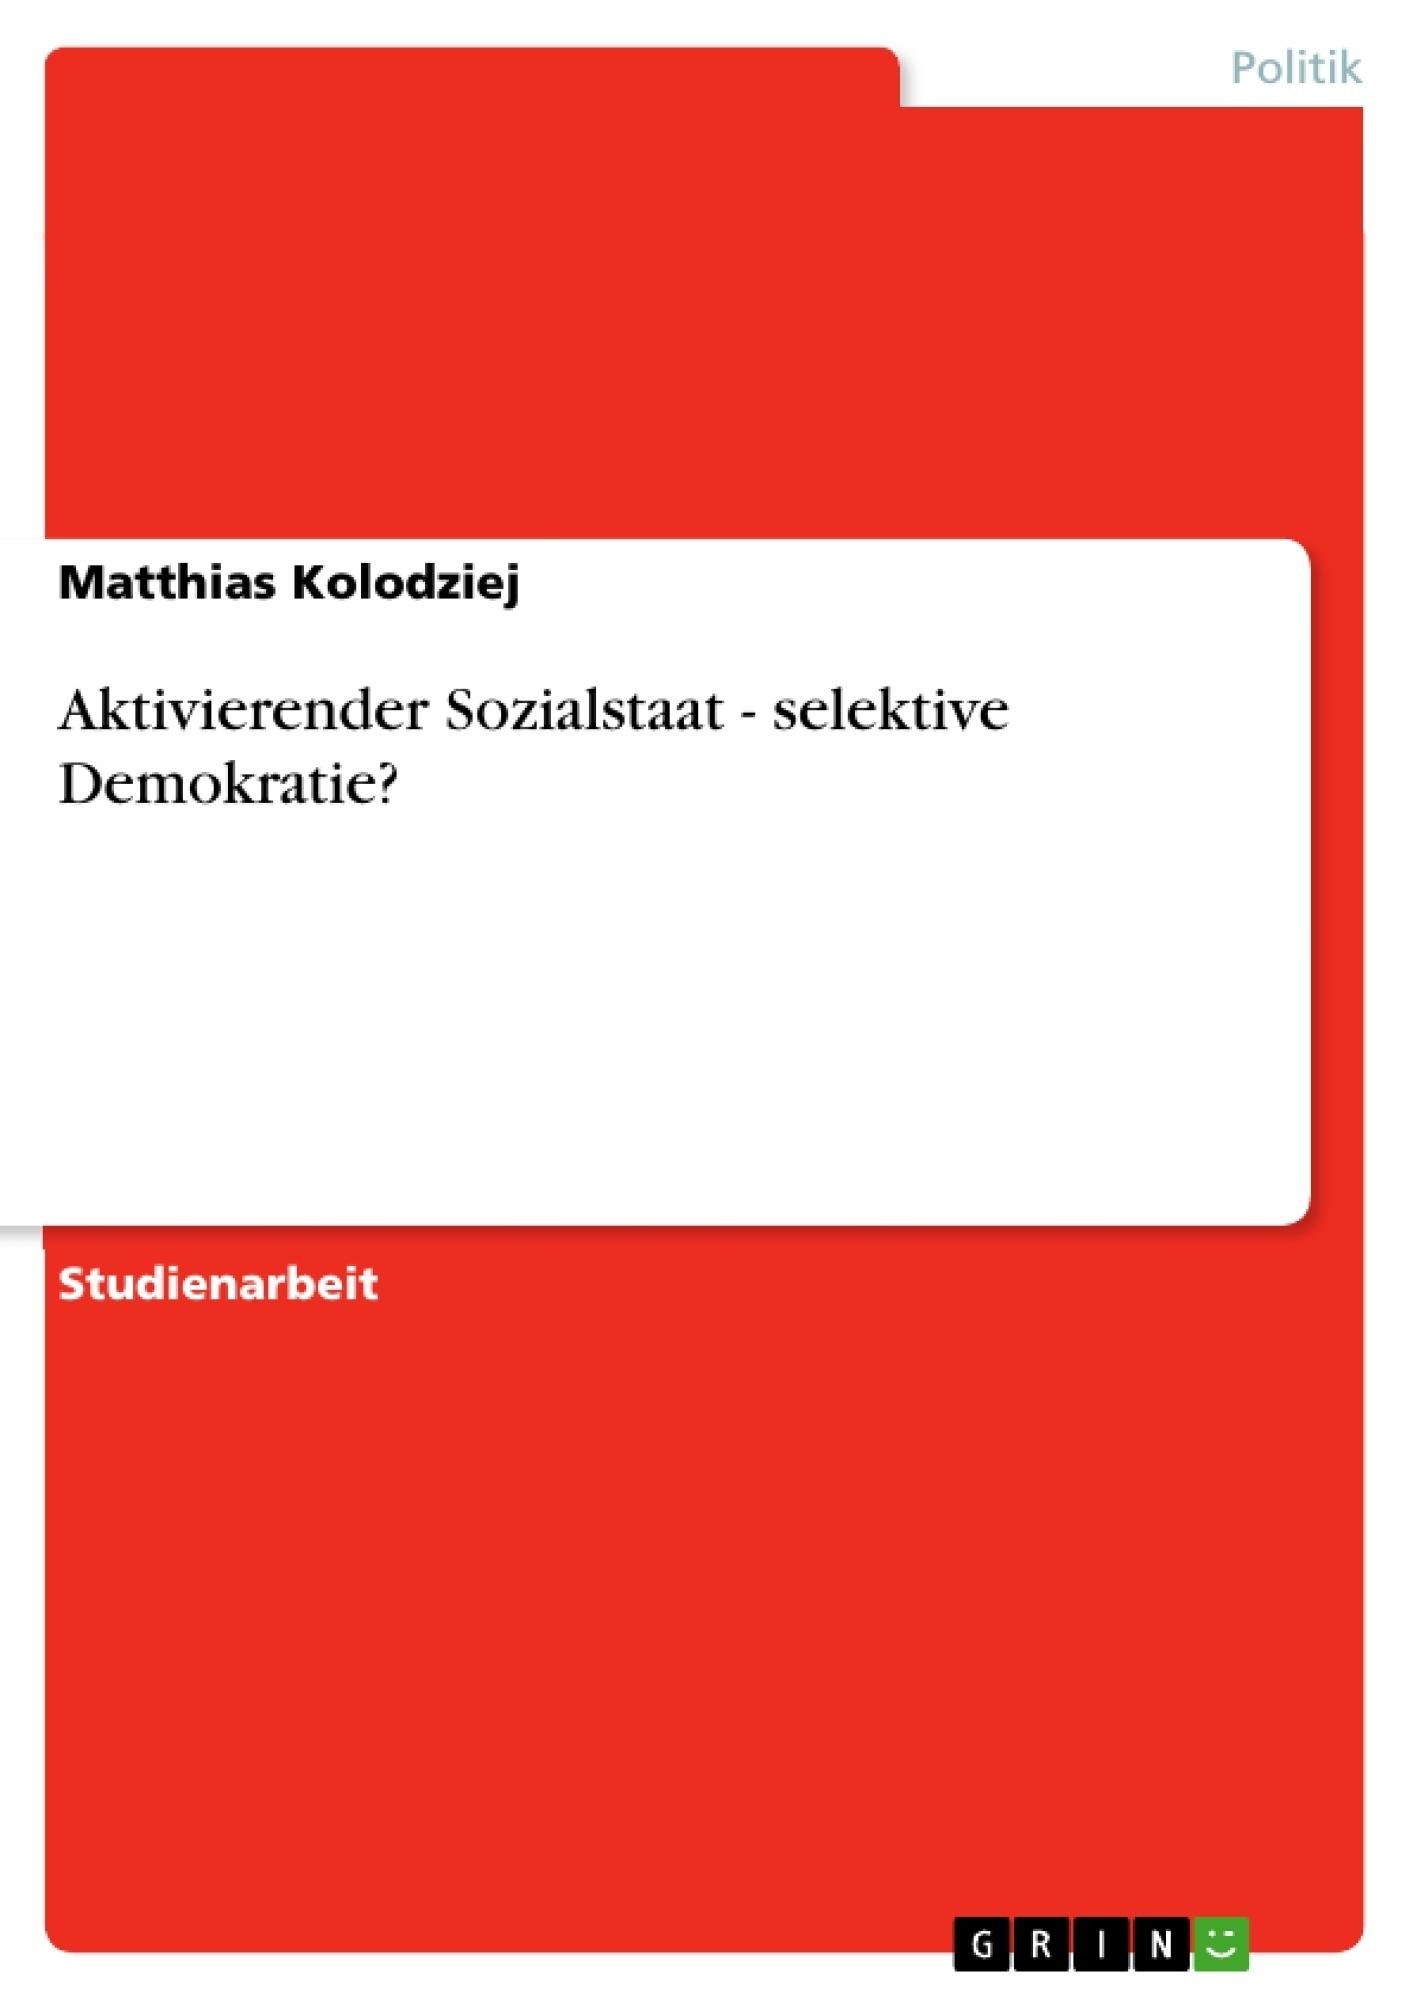 Titel: Aktivierender Sozialstaat - selektive Demokratie?